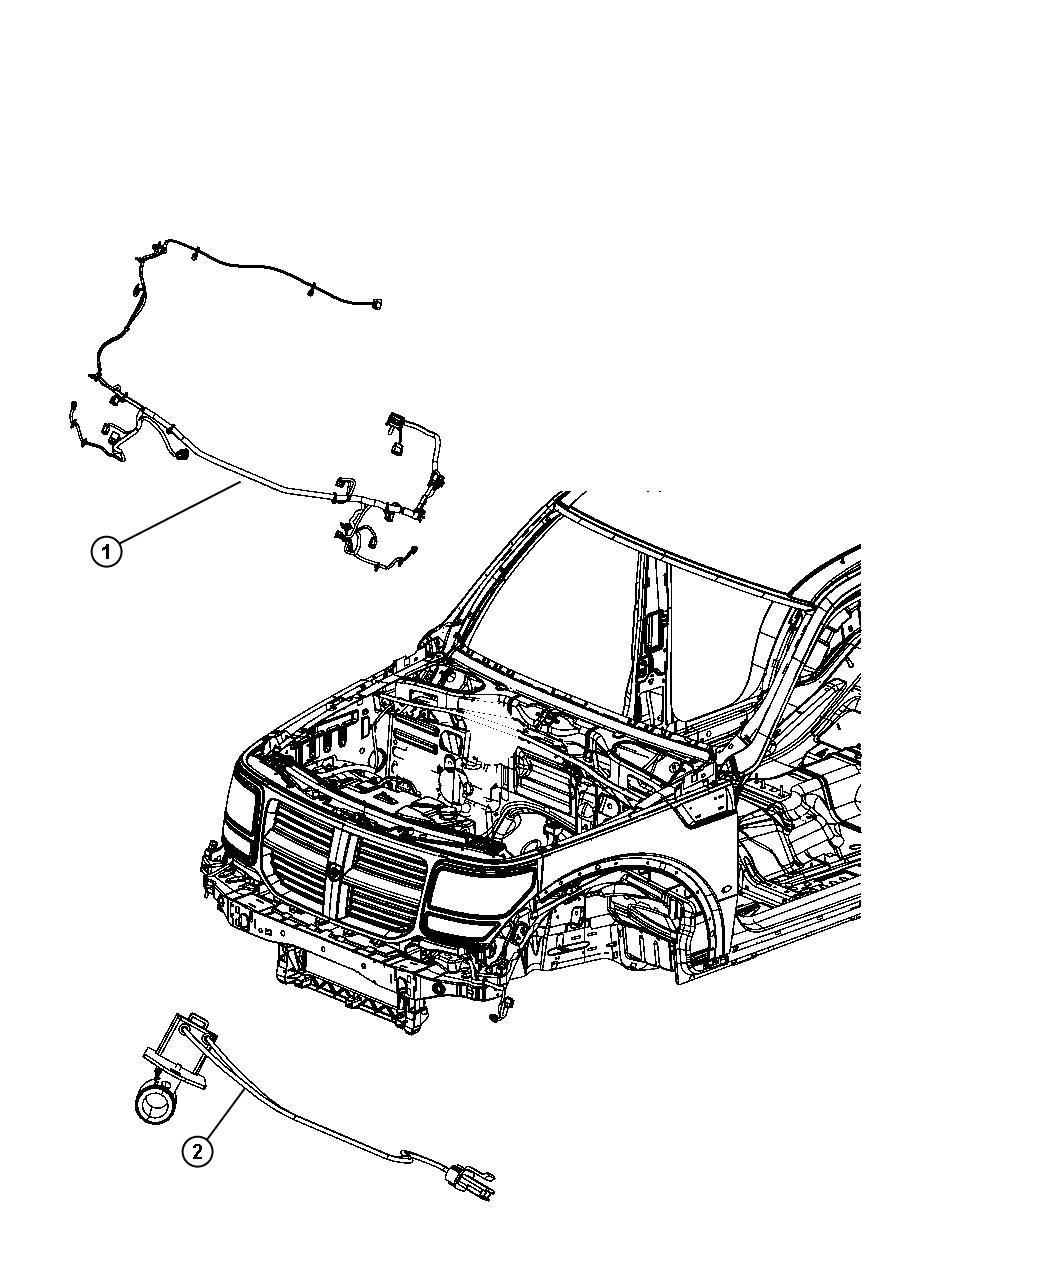 2010 Dodge NITRO Wiring. Front end lighting. Export